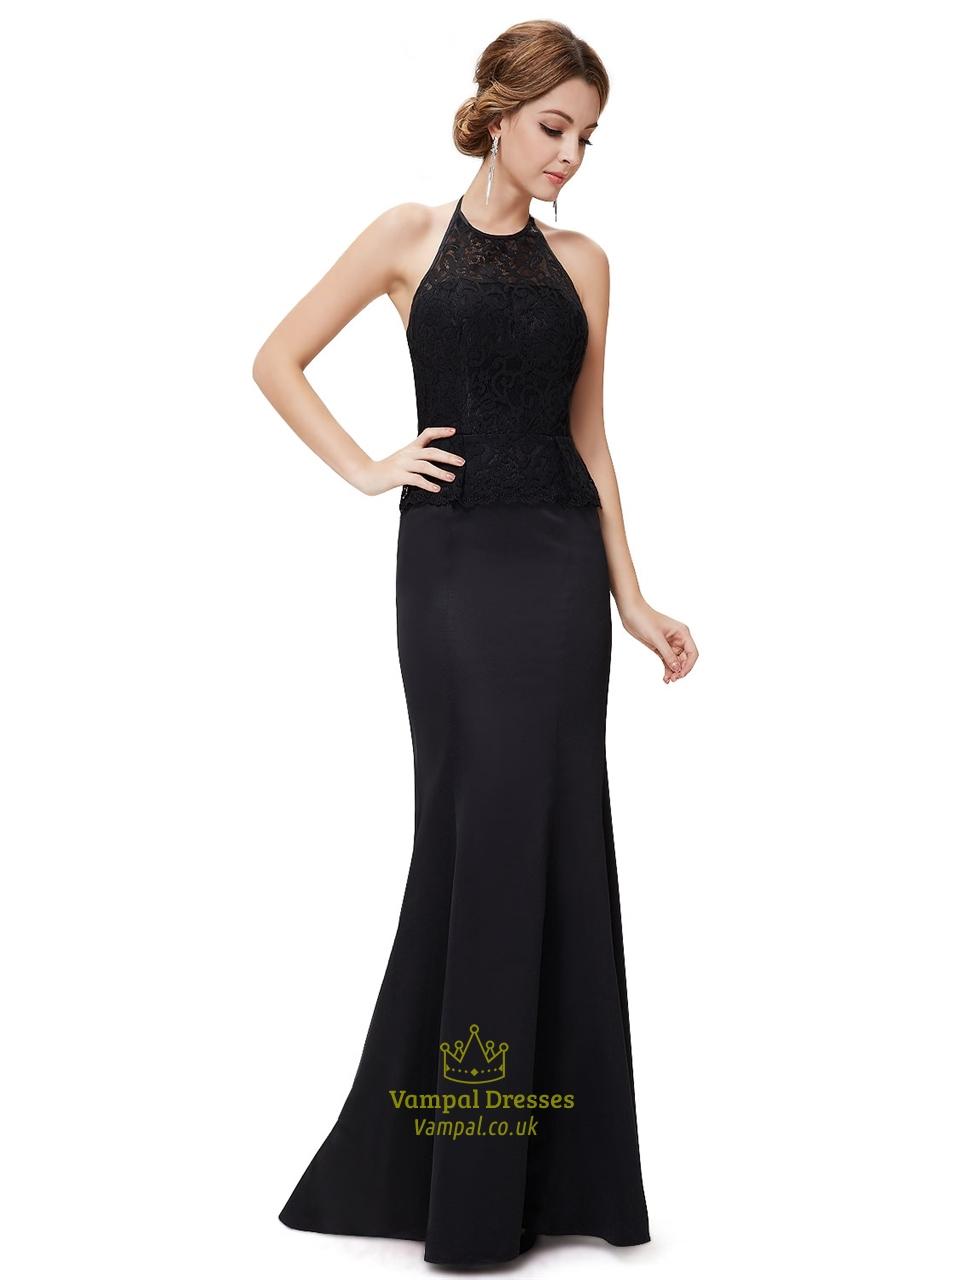 Intriguing Black Mermaid Dress Open Neck Mermaid Prom Dresses Black Mermaid Dress Open Neck Mermaid Prom Dresses Mermaid Prom Dresses Dillards Mermaid Prom Dresses wedding dress Mermaid Prom Dress